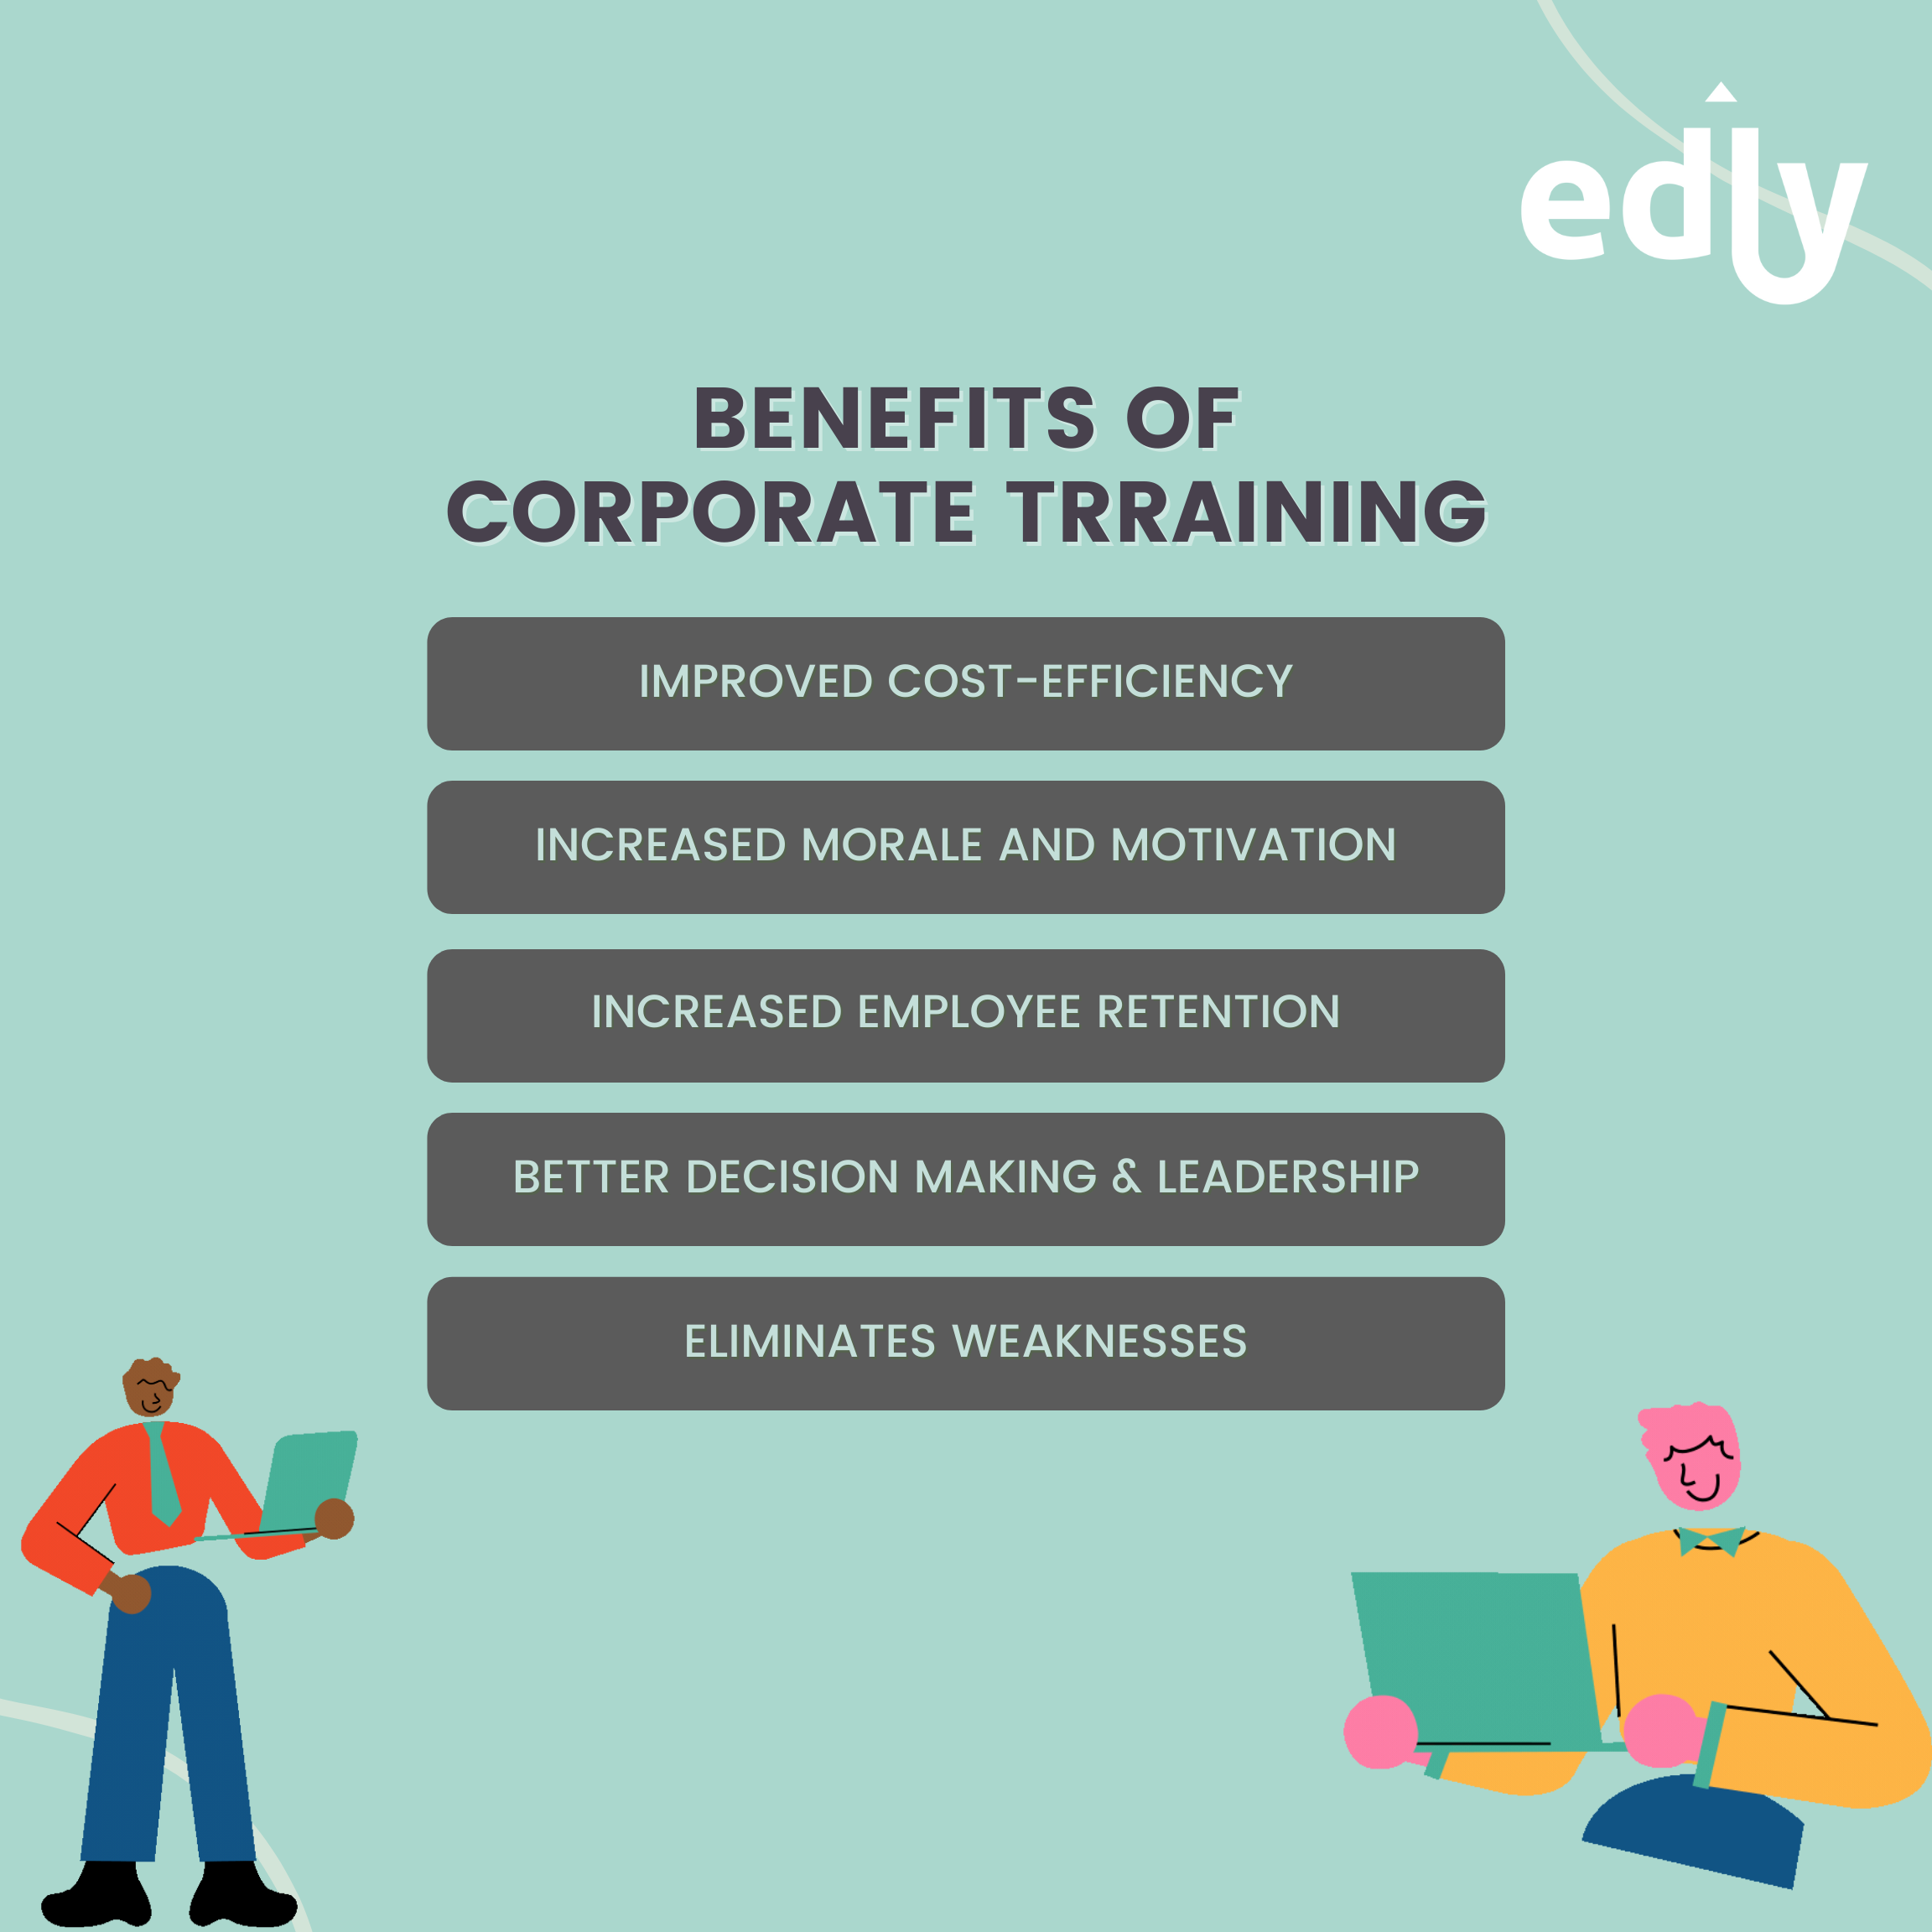 Benefits of Corporate Training